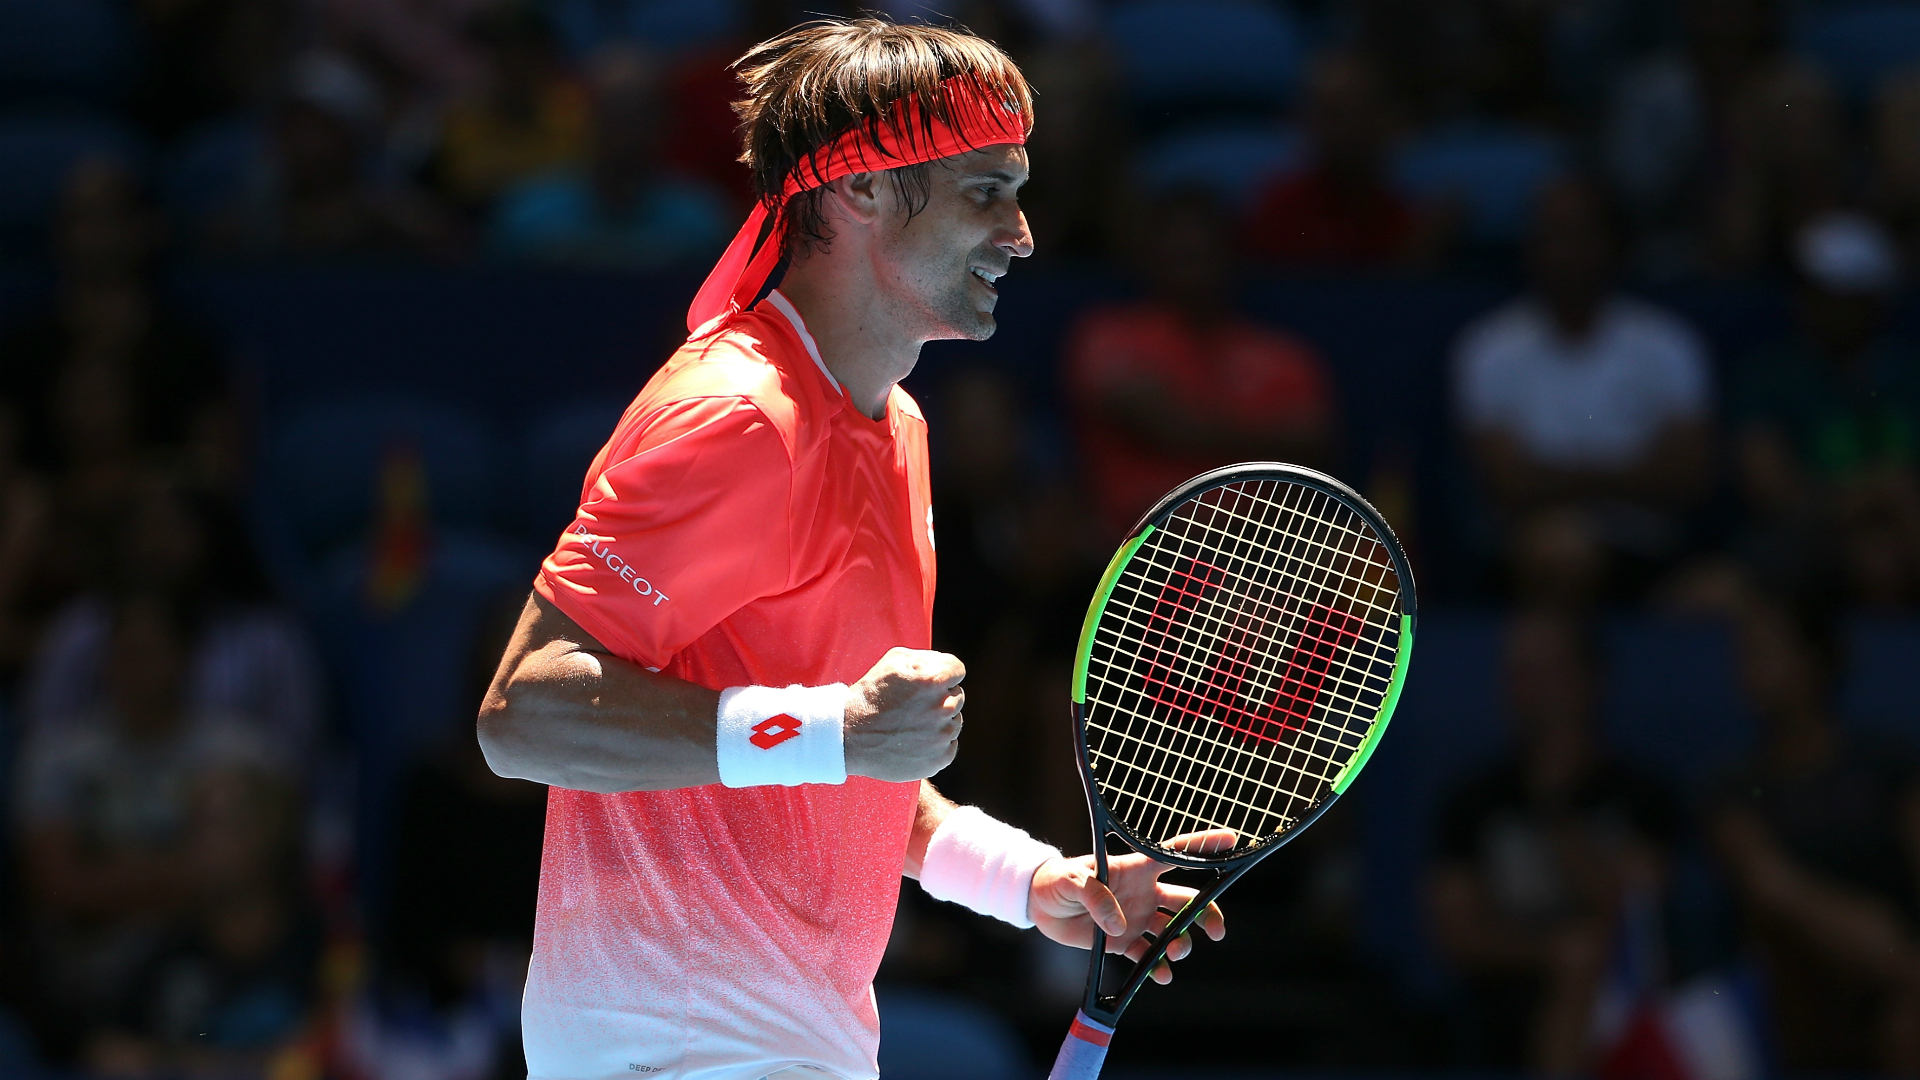 Ferrer saves six set points, Querrey through in New York